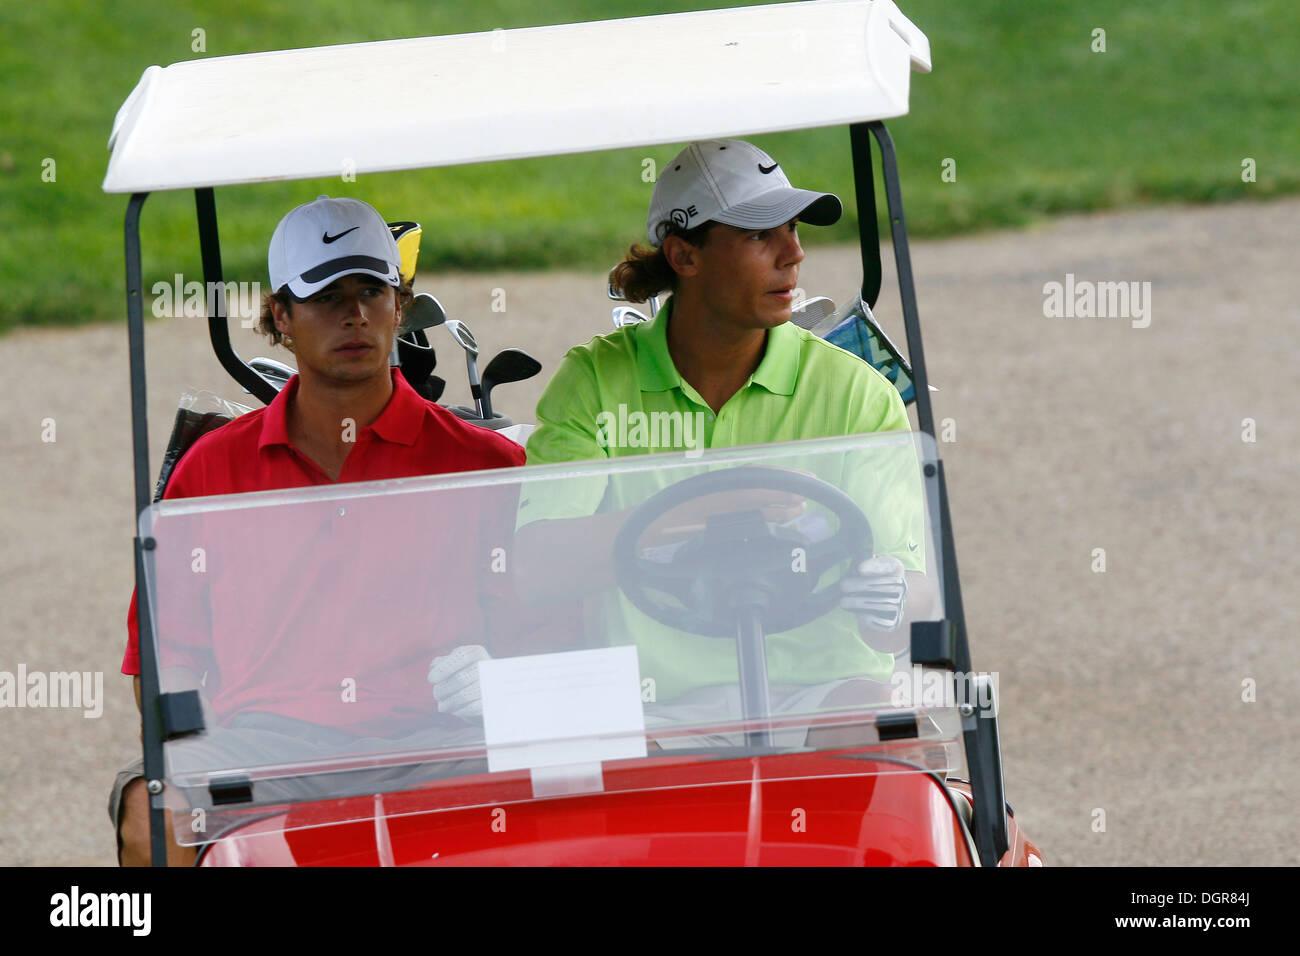 Spain S Tennis Player Rafael Nadal Seen During A Golf Trainig Session Stock Photo 61976898 Alamy